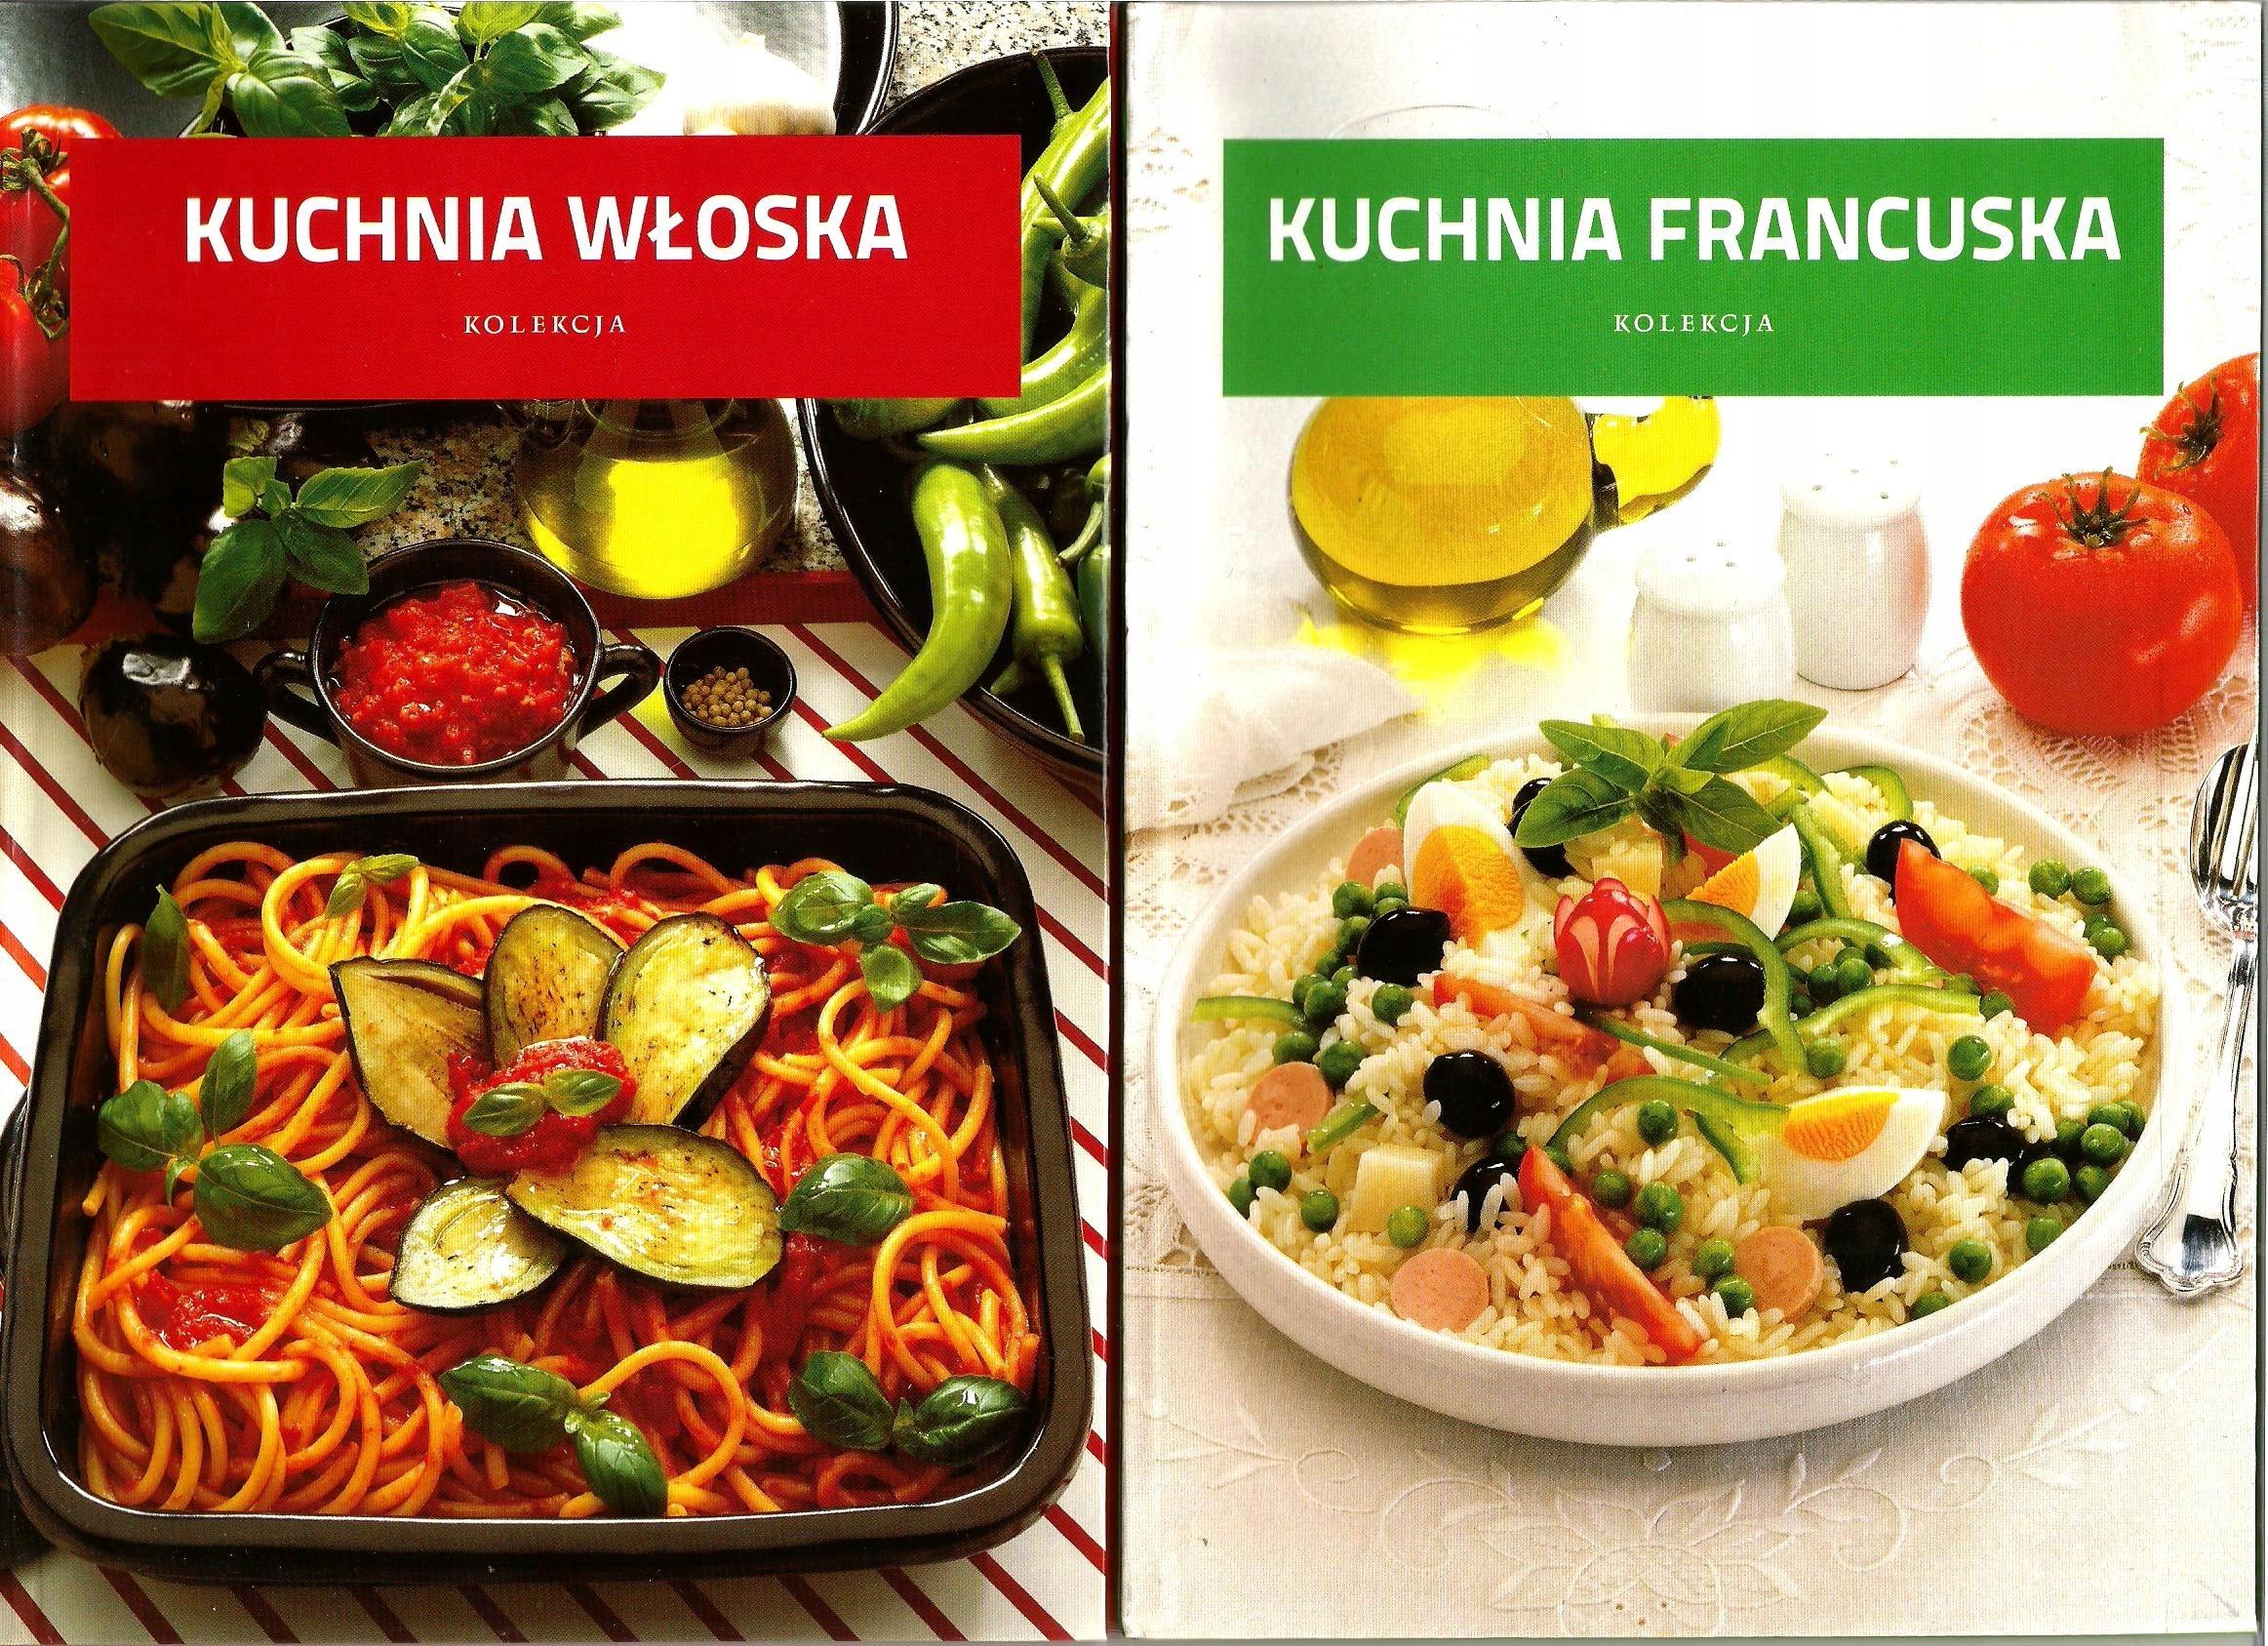 Kuchnia Rosyjska Francuska Włoska 3 Książki Nowe